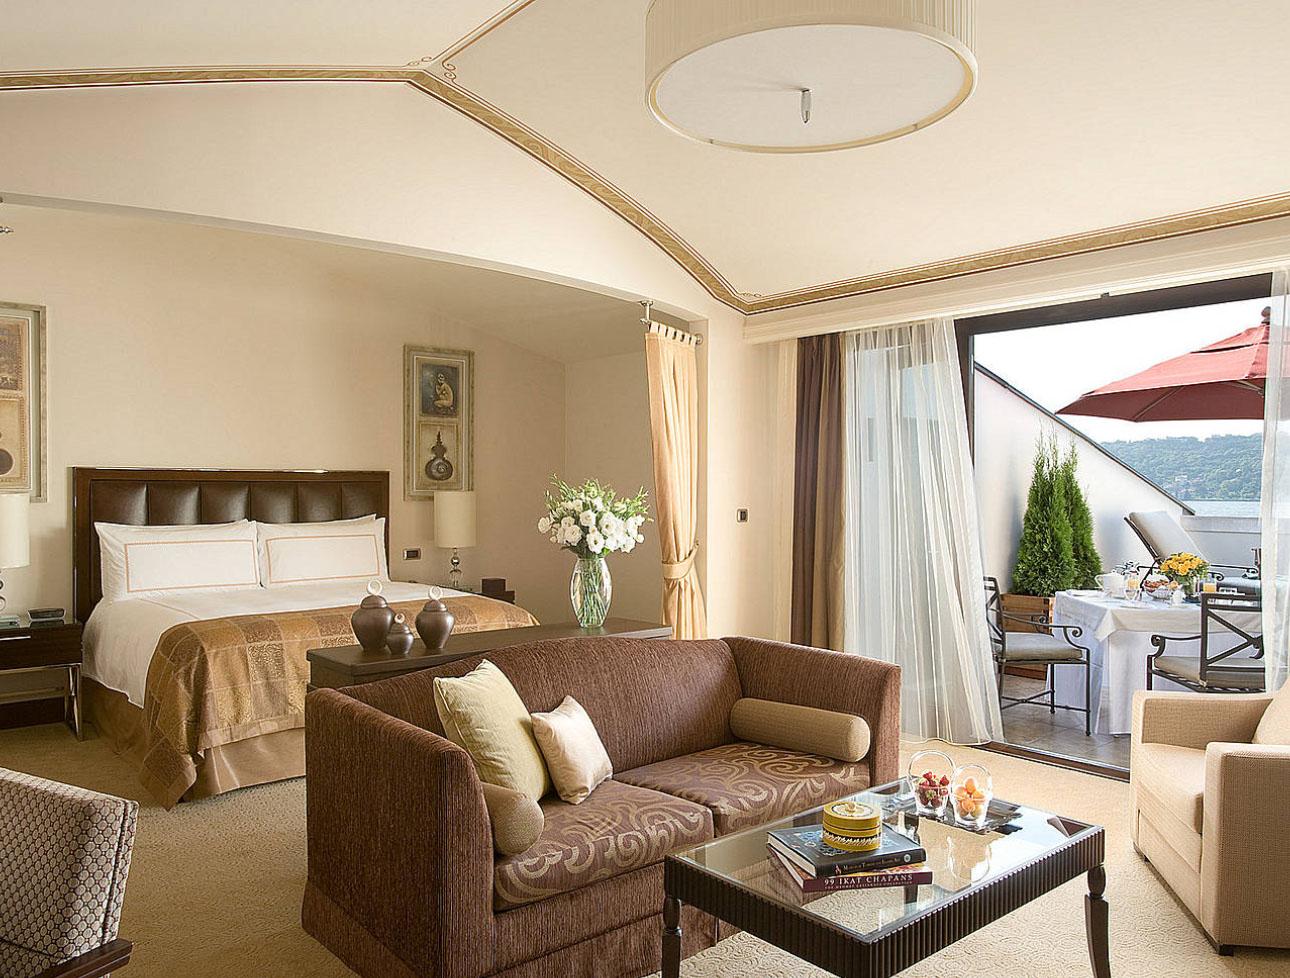 Four Seasons Hotel Istanbul At The Bosphorus  iDesignArch  Interior Design Architecture